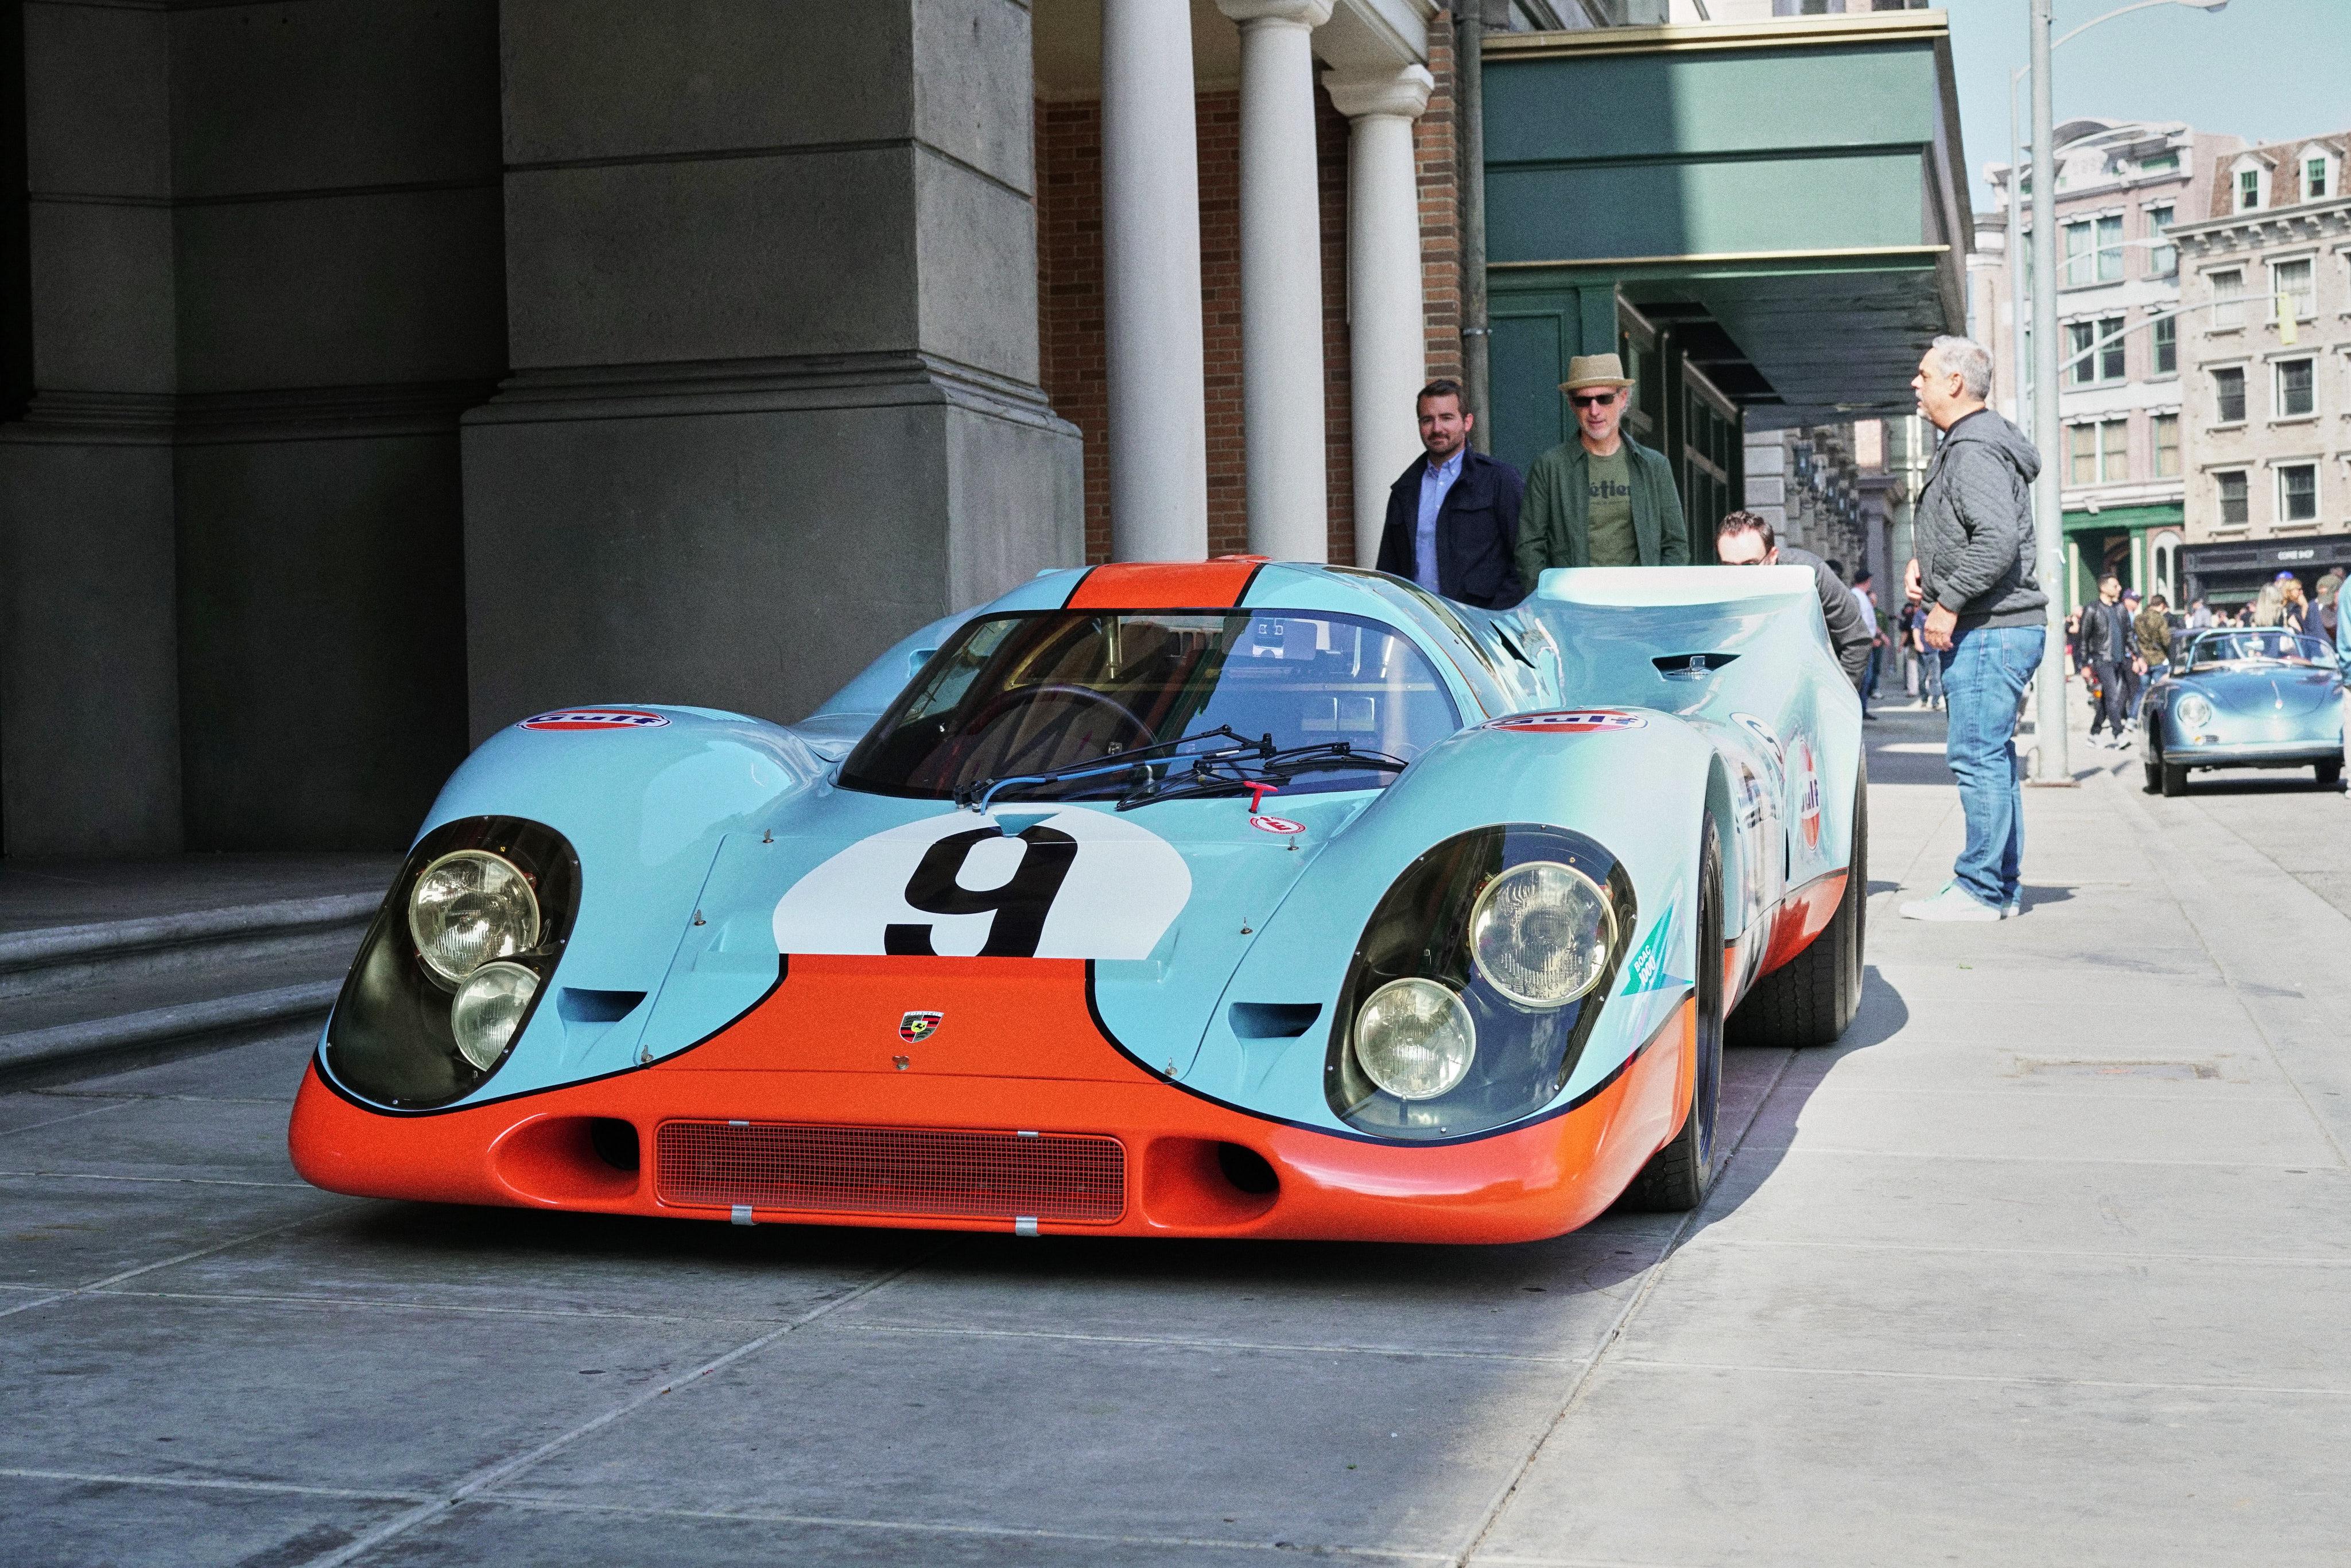 Luftgekühlt-6-Rennen-19-Porsche-917-1969-Gulf-Blue-Front